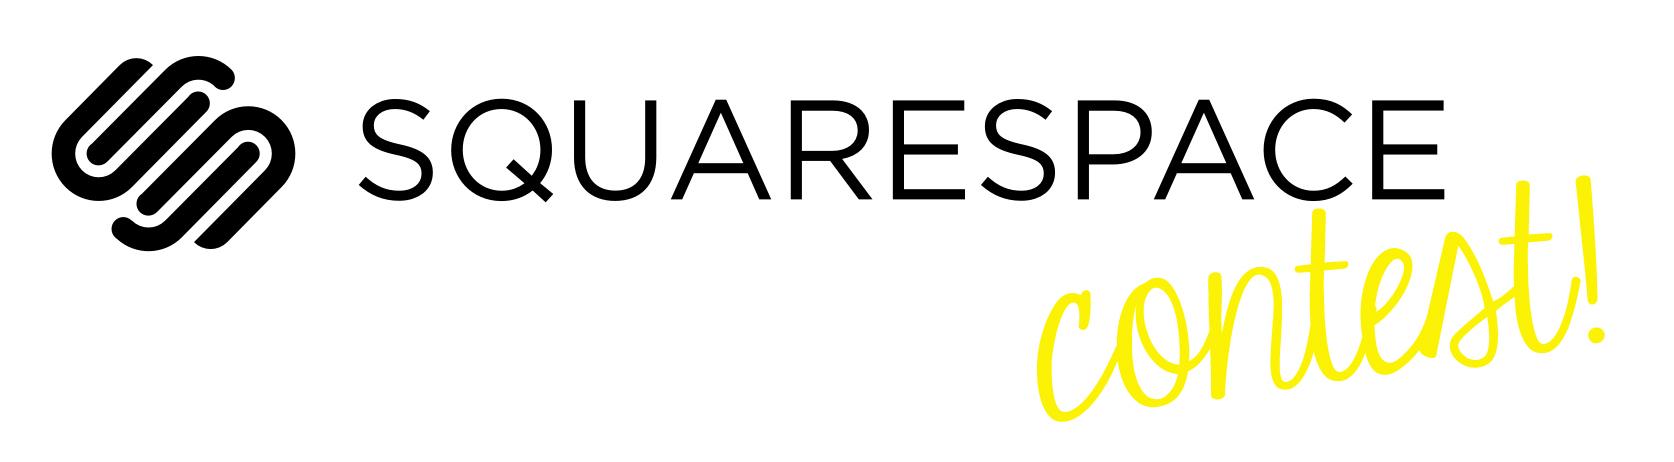 squarespace-logo@2x.jpg